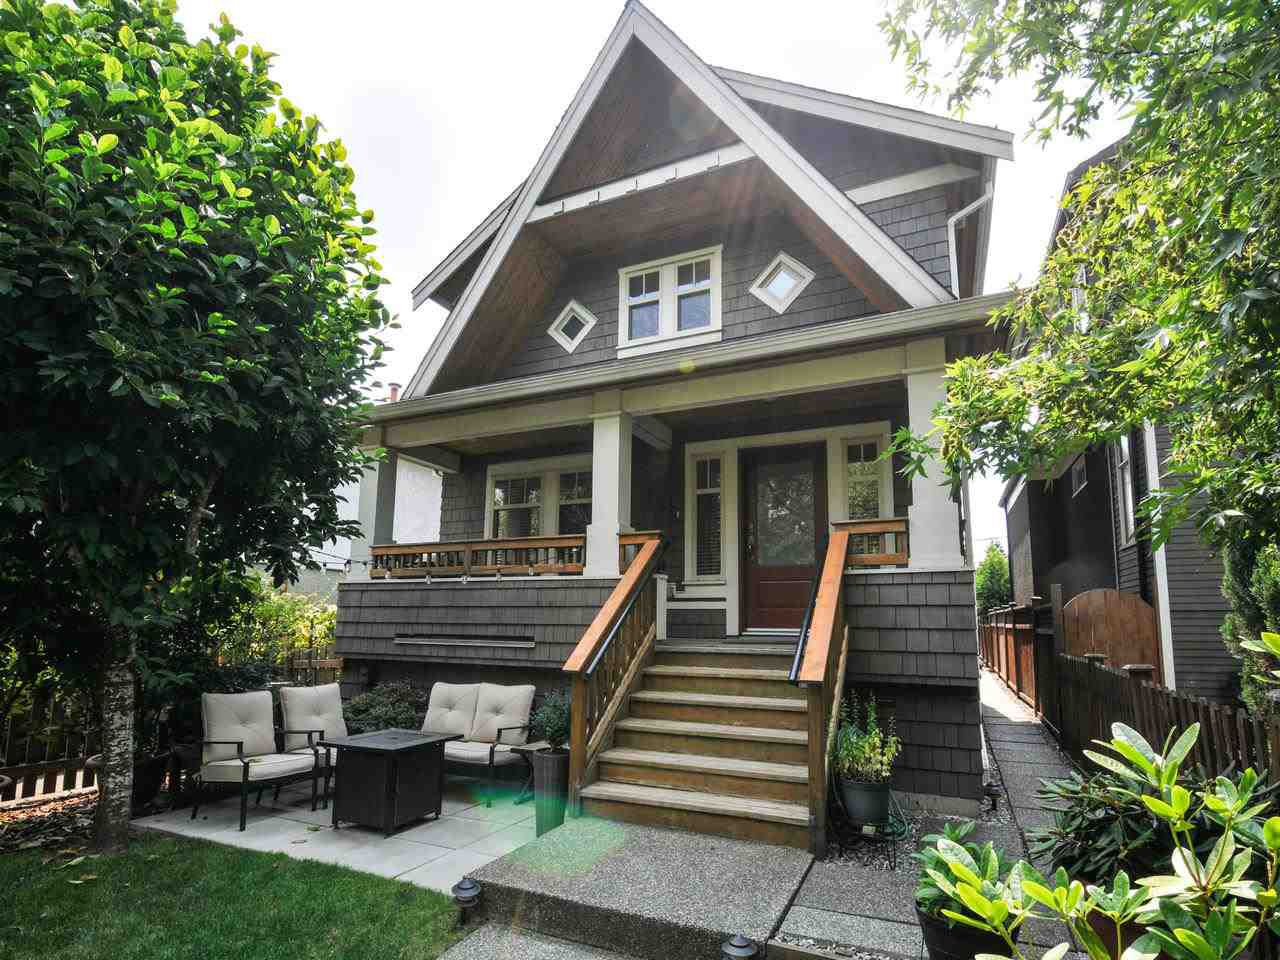 Main Photo: 1252 E 11TH AVENUE in Vancouver: Mount Pleasant VE House 1/2 Duplex for sale (Vancouver East)  : MLS®# R2317312